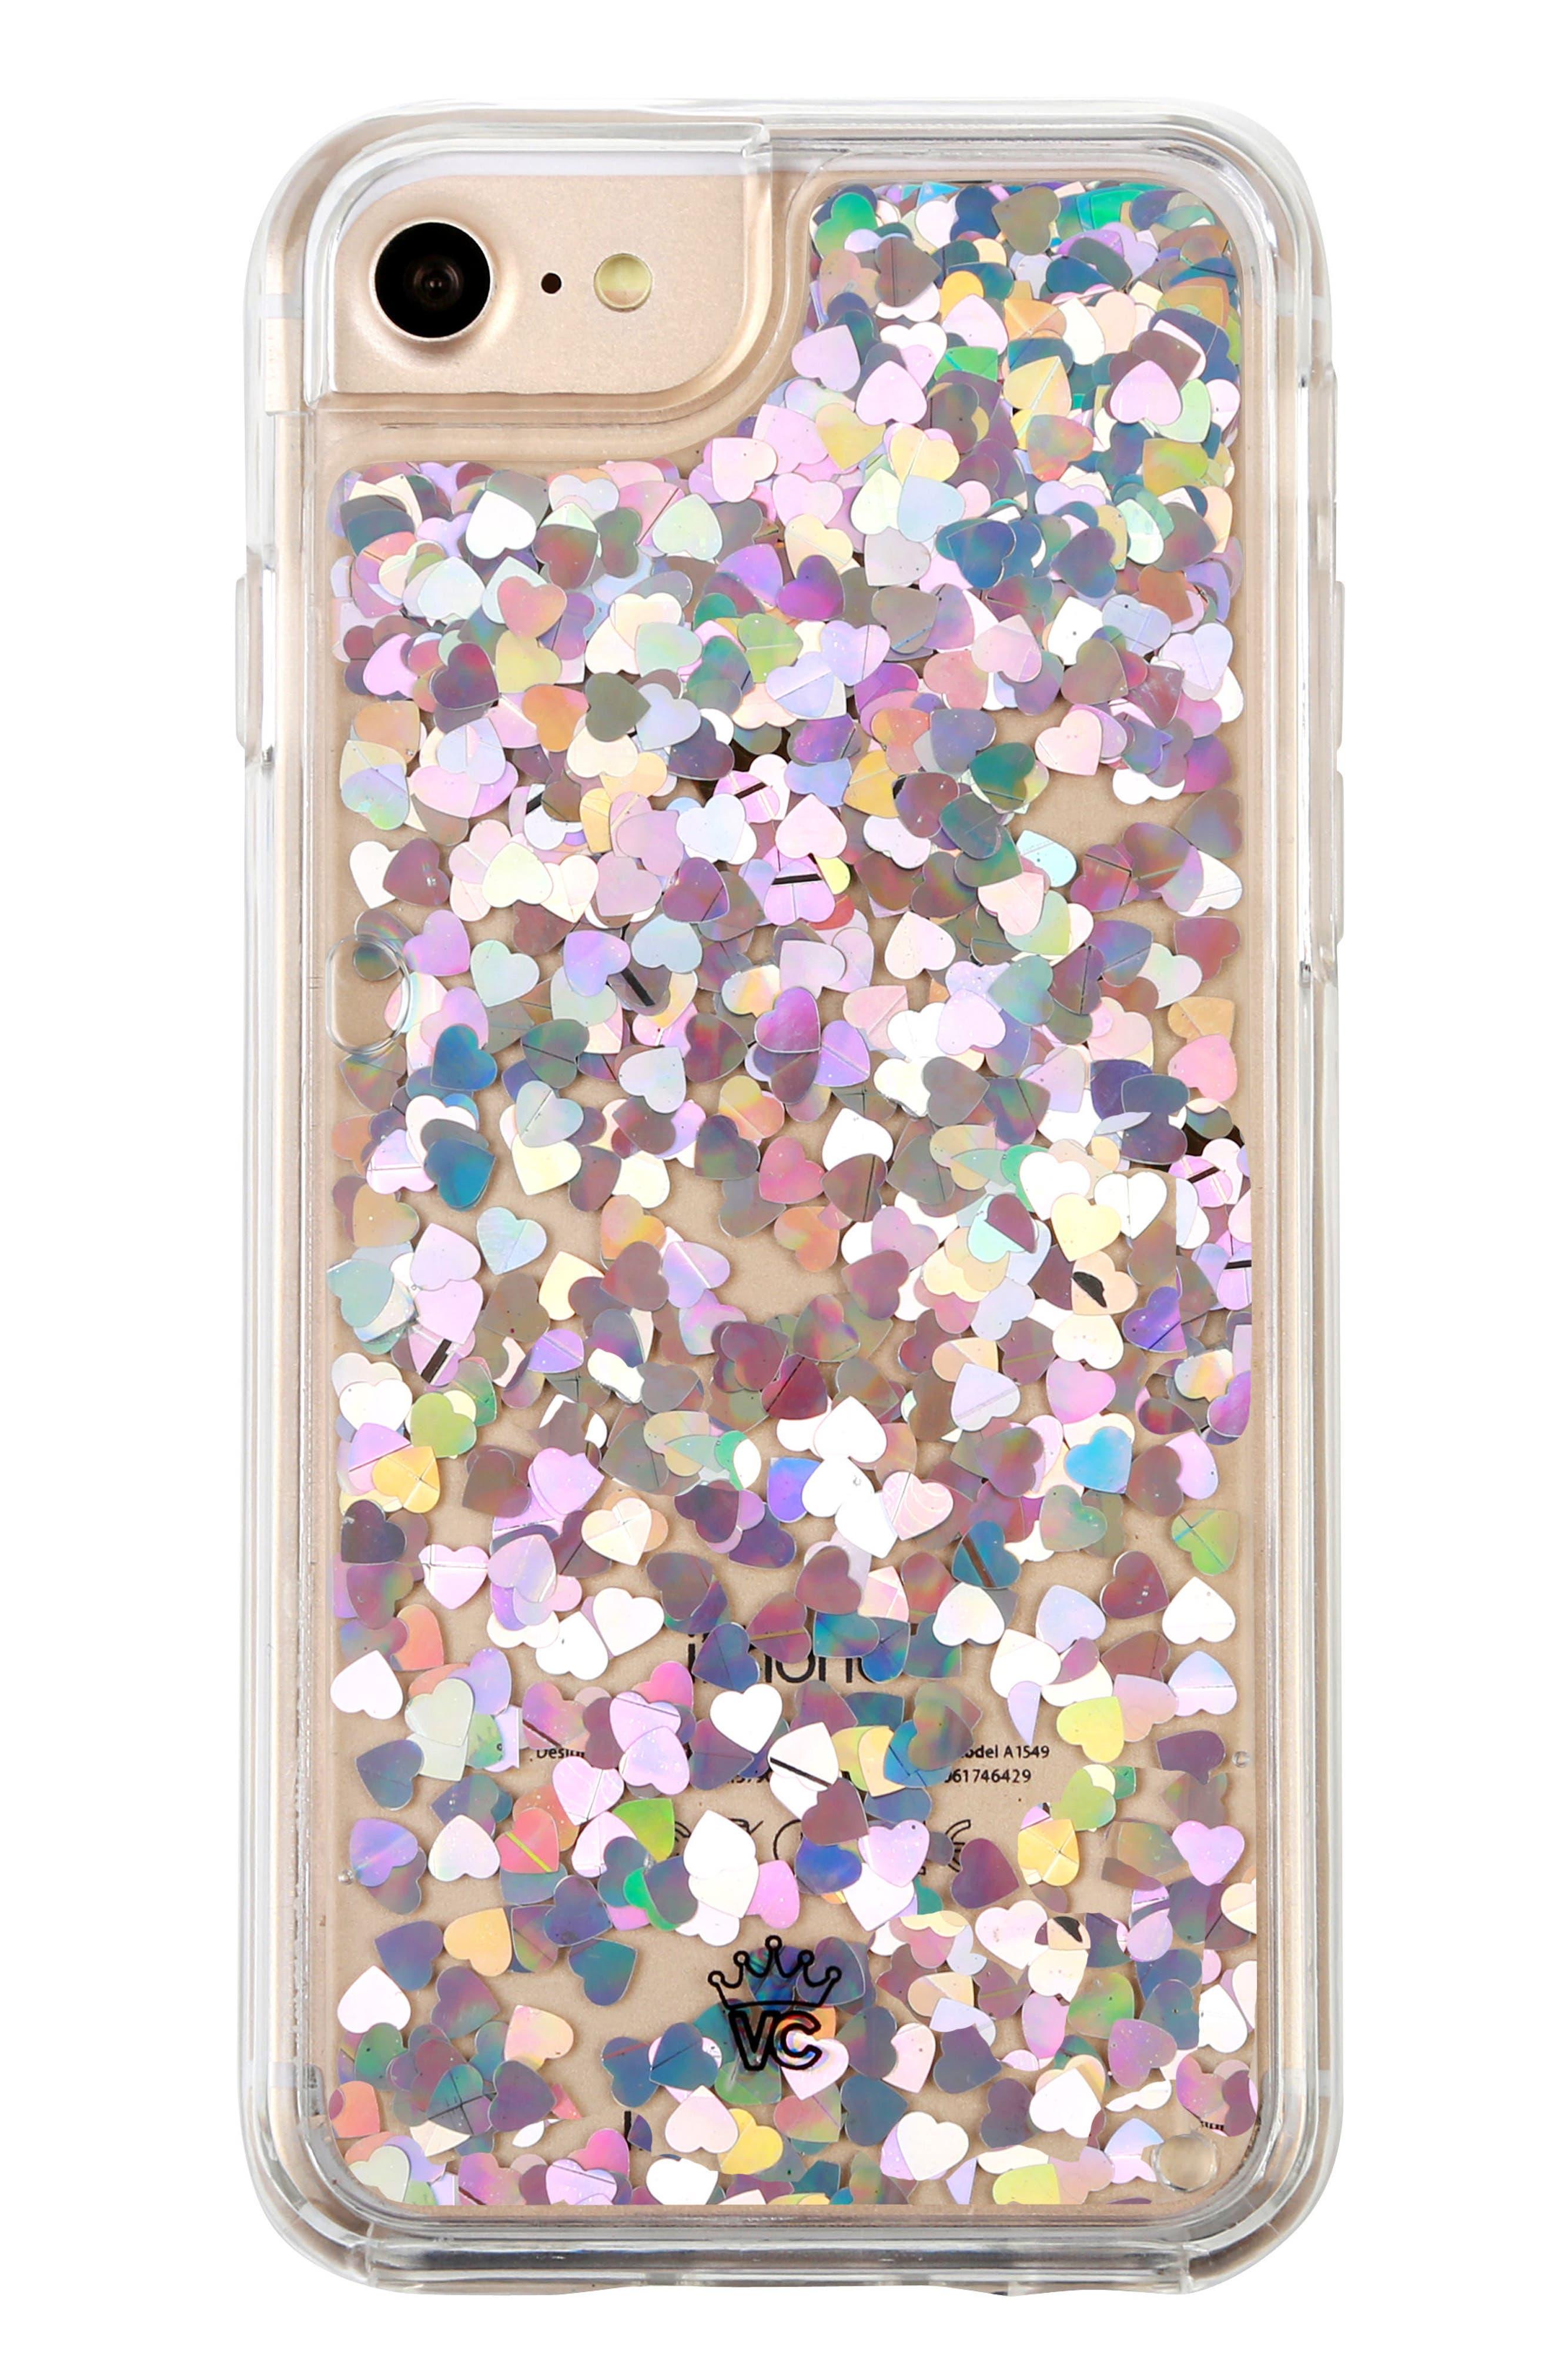 Holo Hearts iPhone 7 Case,                             Main thumbnail 1, color,                             040